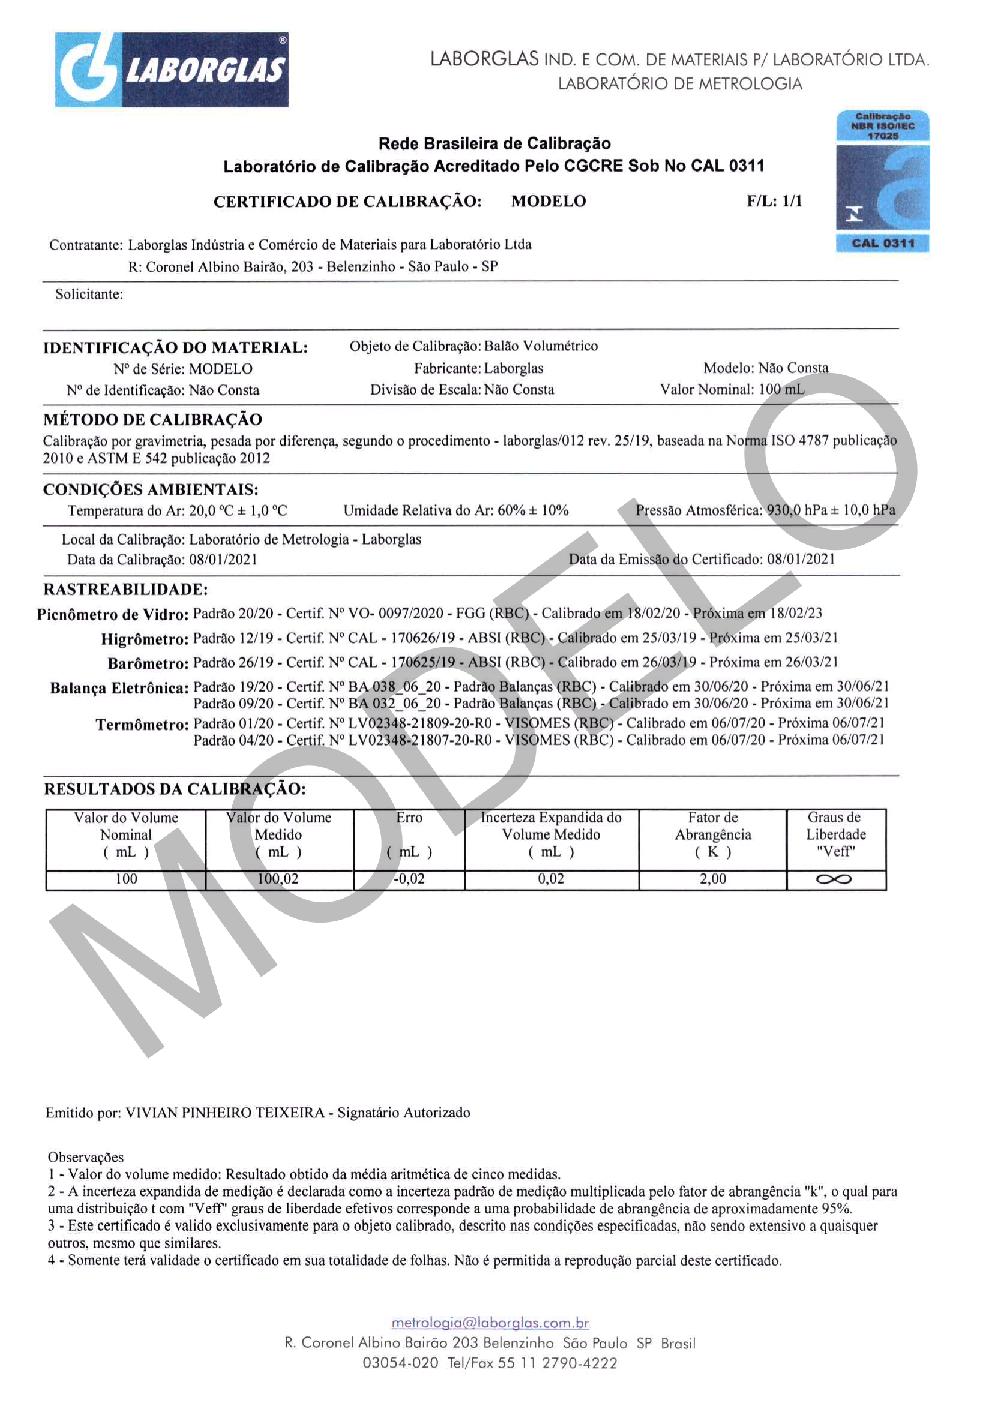 BALÃO VOLUMÉTRICO CLASSE A ROLHA POLI ÂMBAR C/ CERTIFICADO RBC 50 ML - Marca Laborglas - Cód. 91678176-R